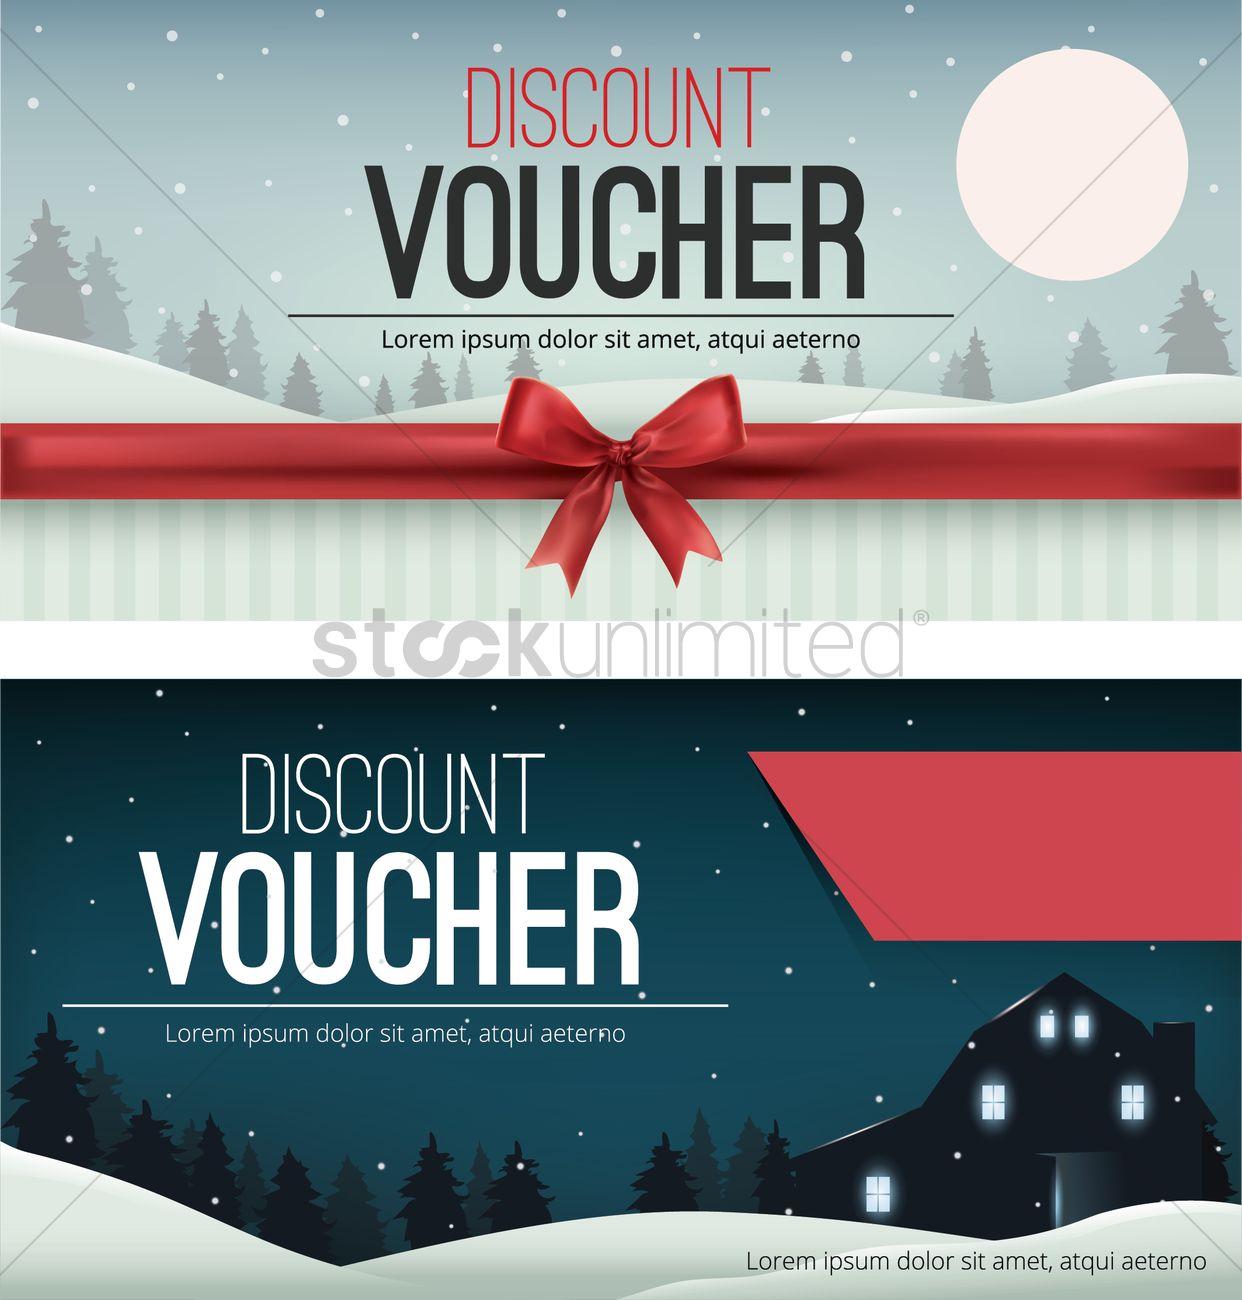 Discount Voucher Design Vector Graphic  Discount Voucher Design